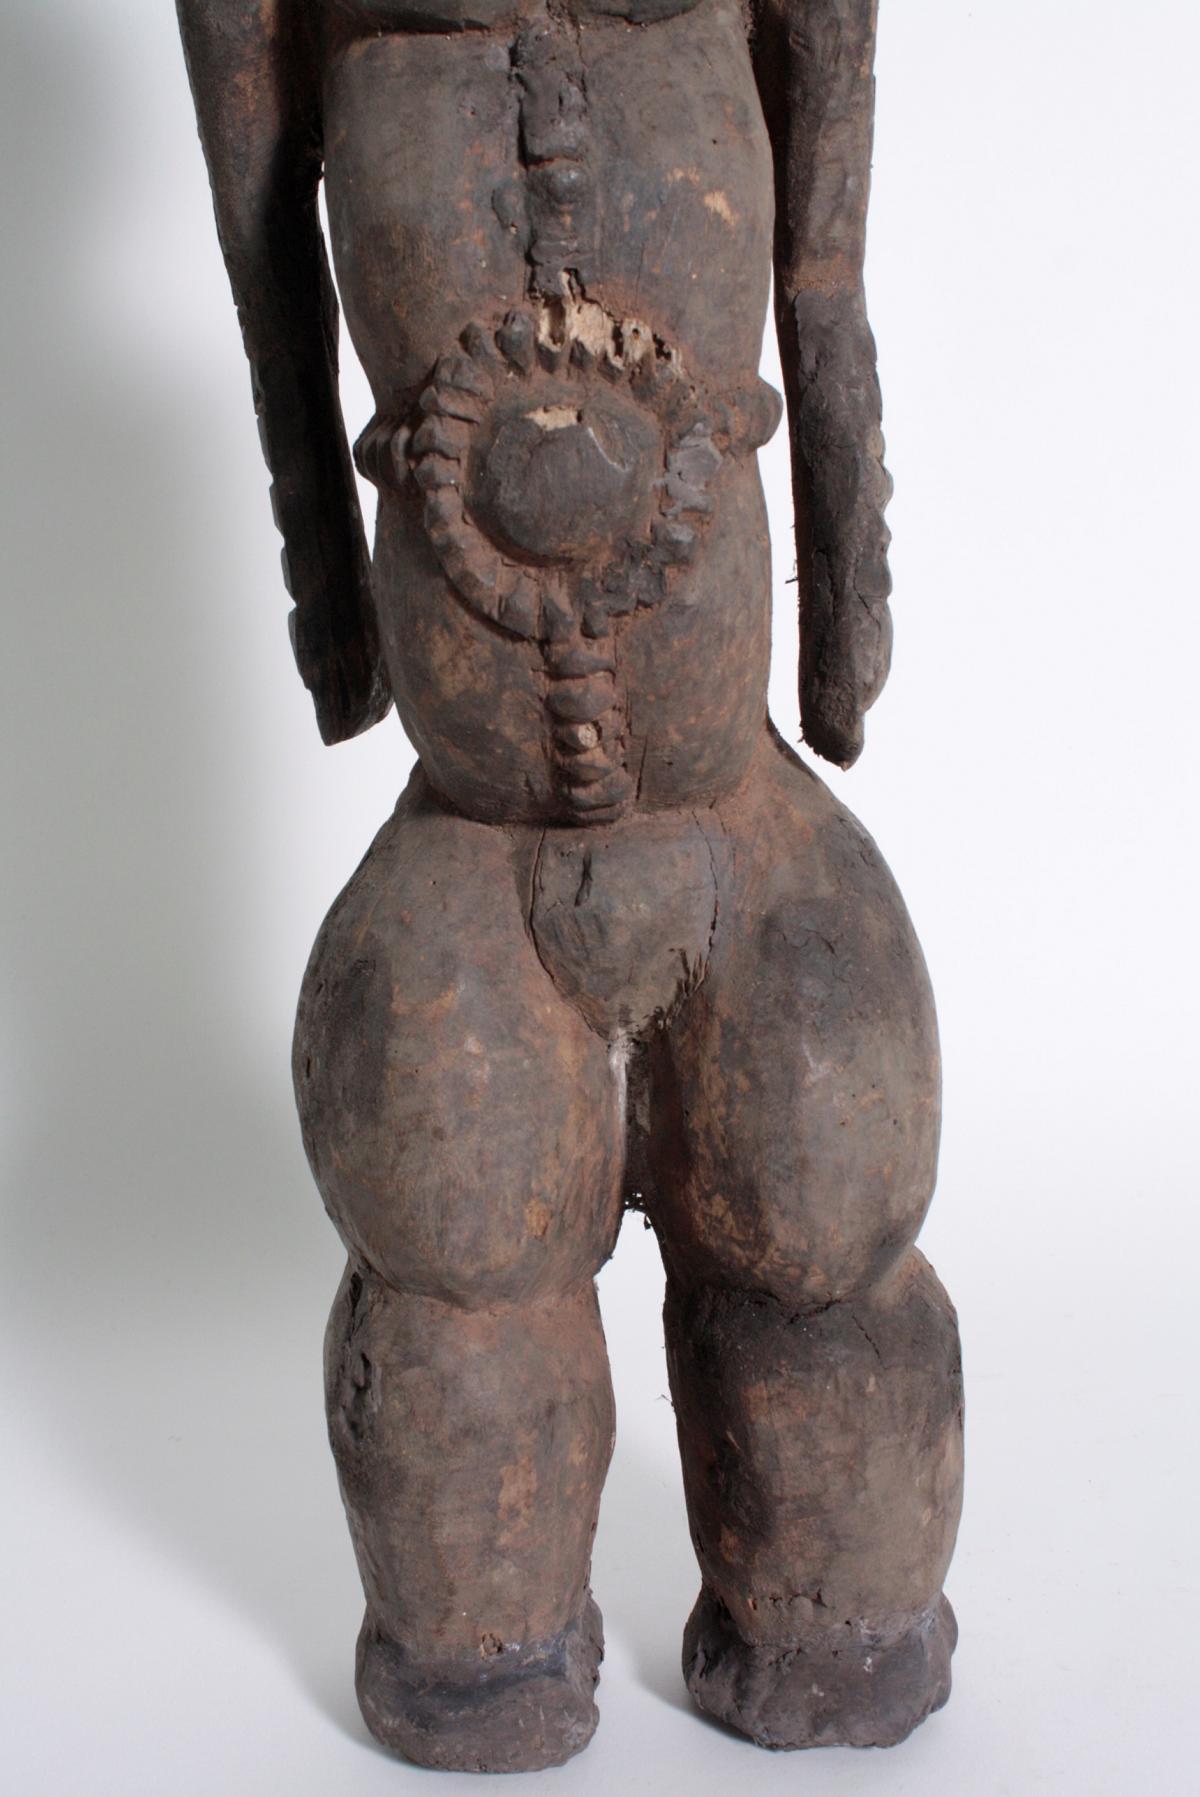 Ältere Ahnen-Figur, Tabwa, D. R. Kongo-3